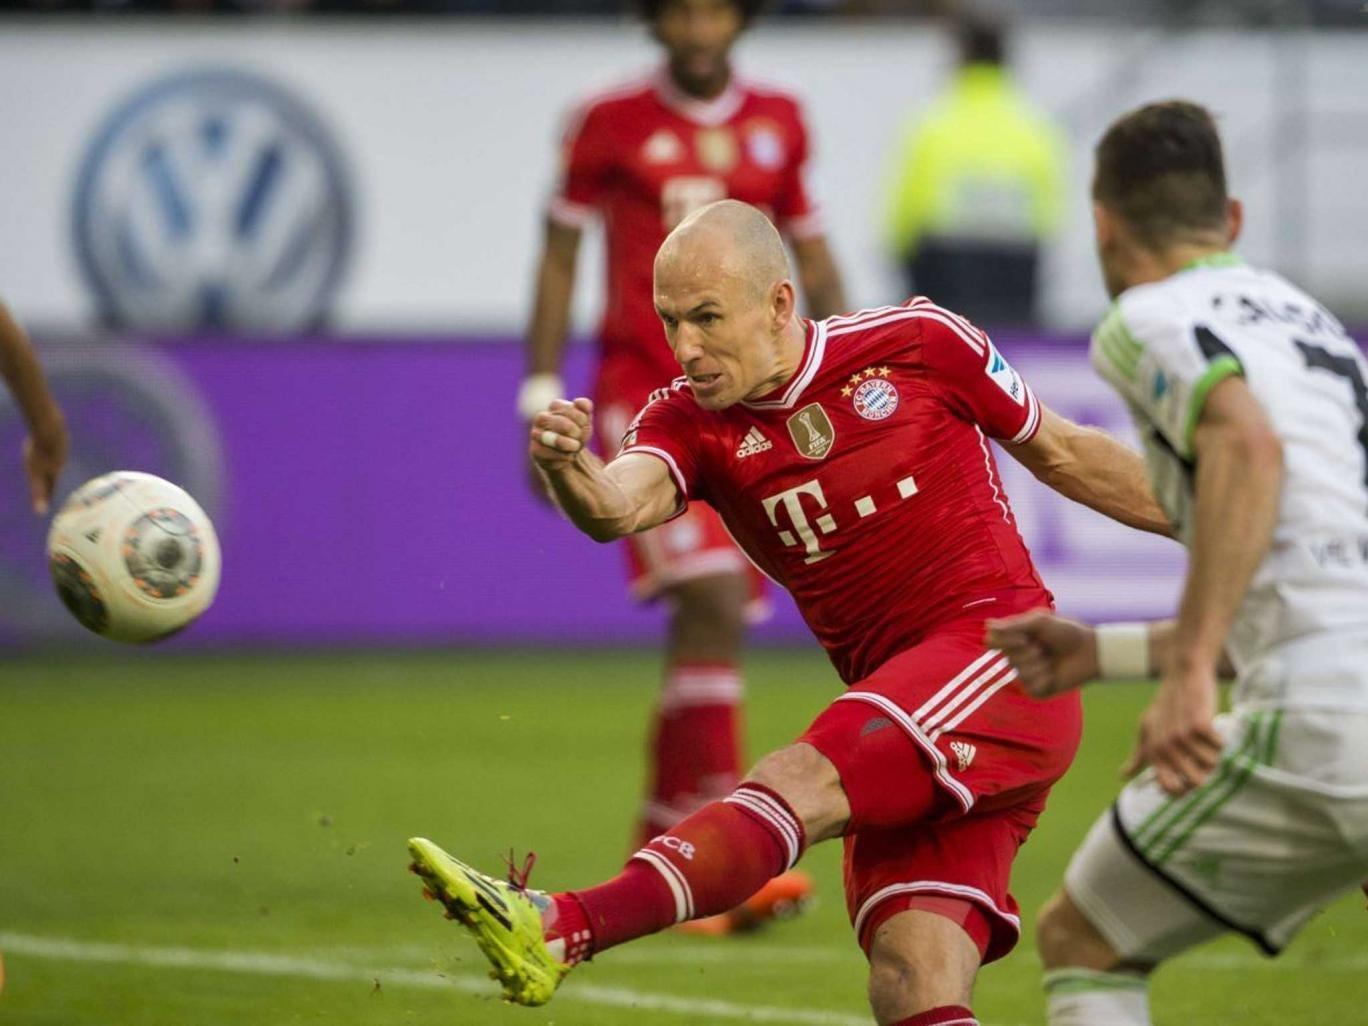 Bayern Munich's Dutch midfielder Arjen Robben shoots a goal during the German first division Bundesliga football match